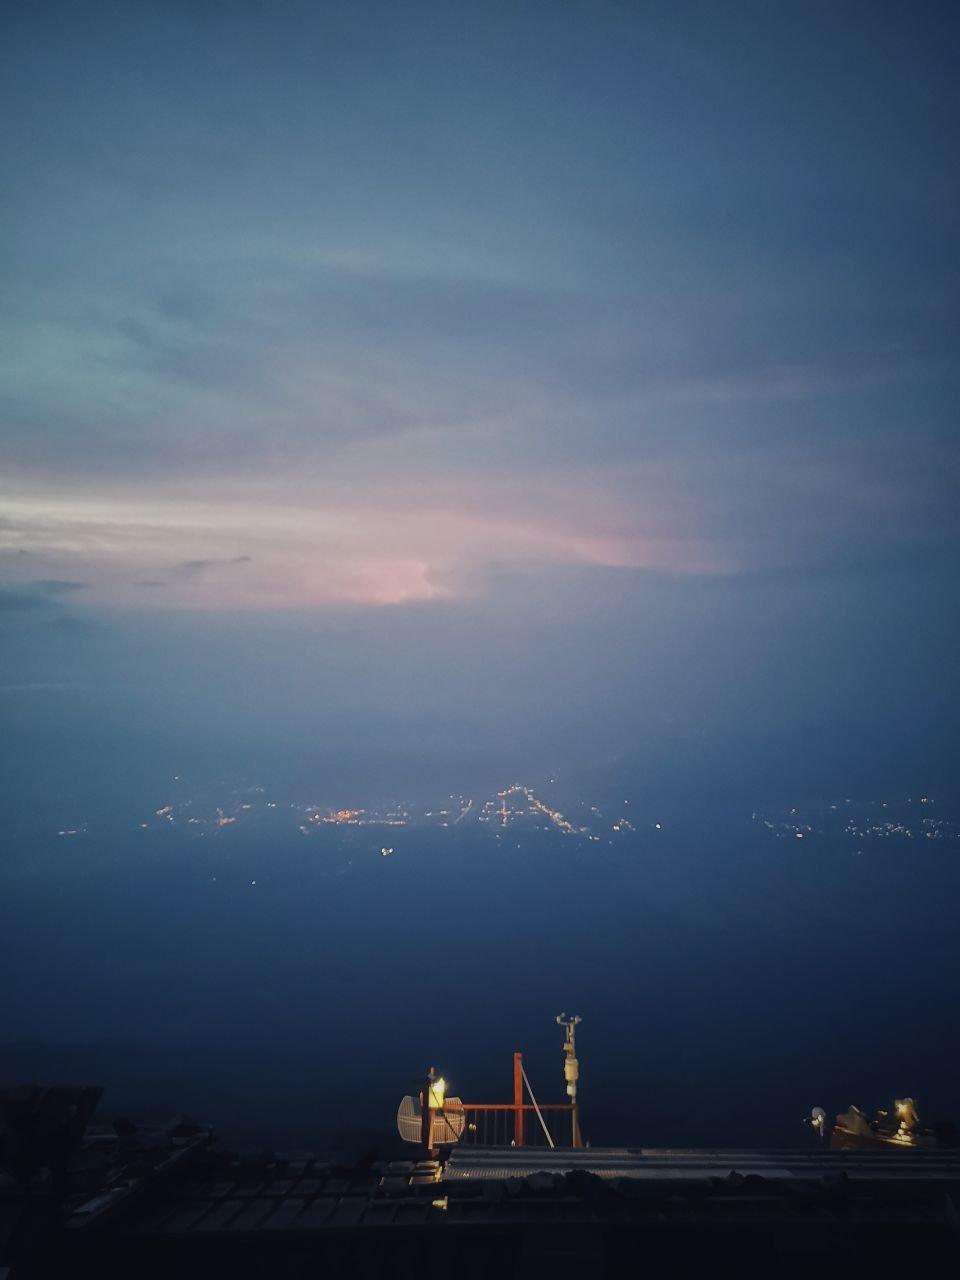 Trip: Climbing Mt. Fuji